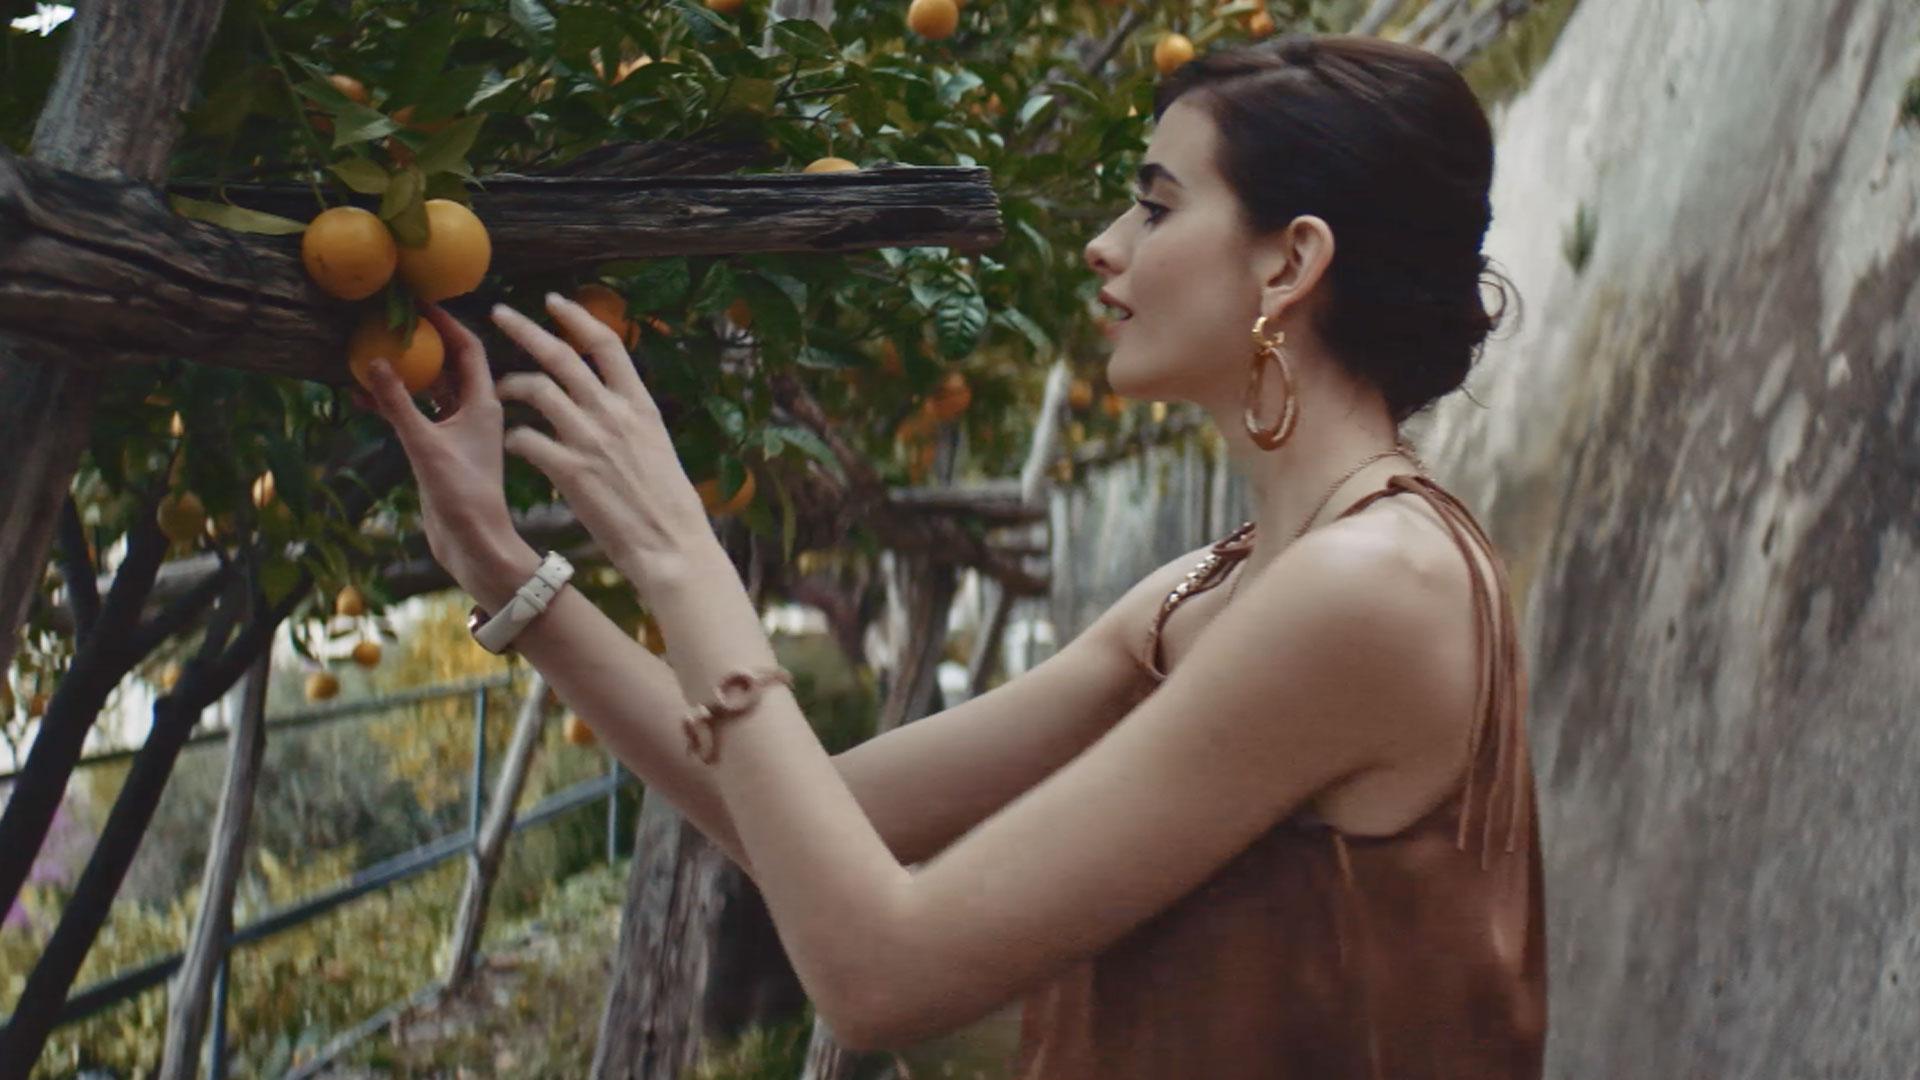 NH Hotels - Emotional trip - La casa del futuro - Produzione video - Commercial